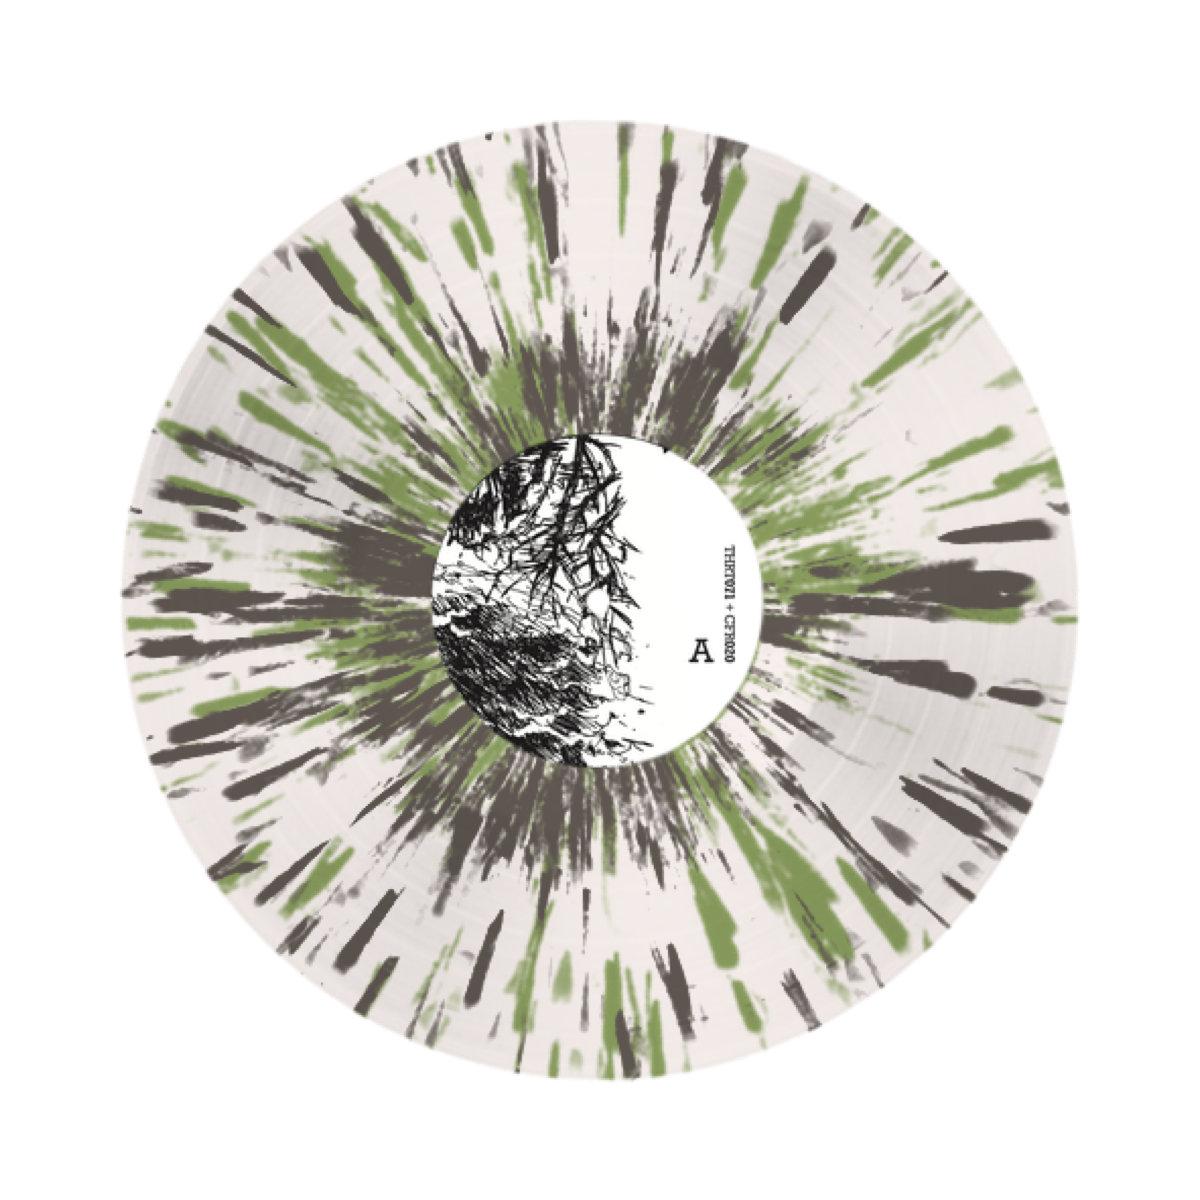 A Sense Of Rest | Throatruiner Records